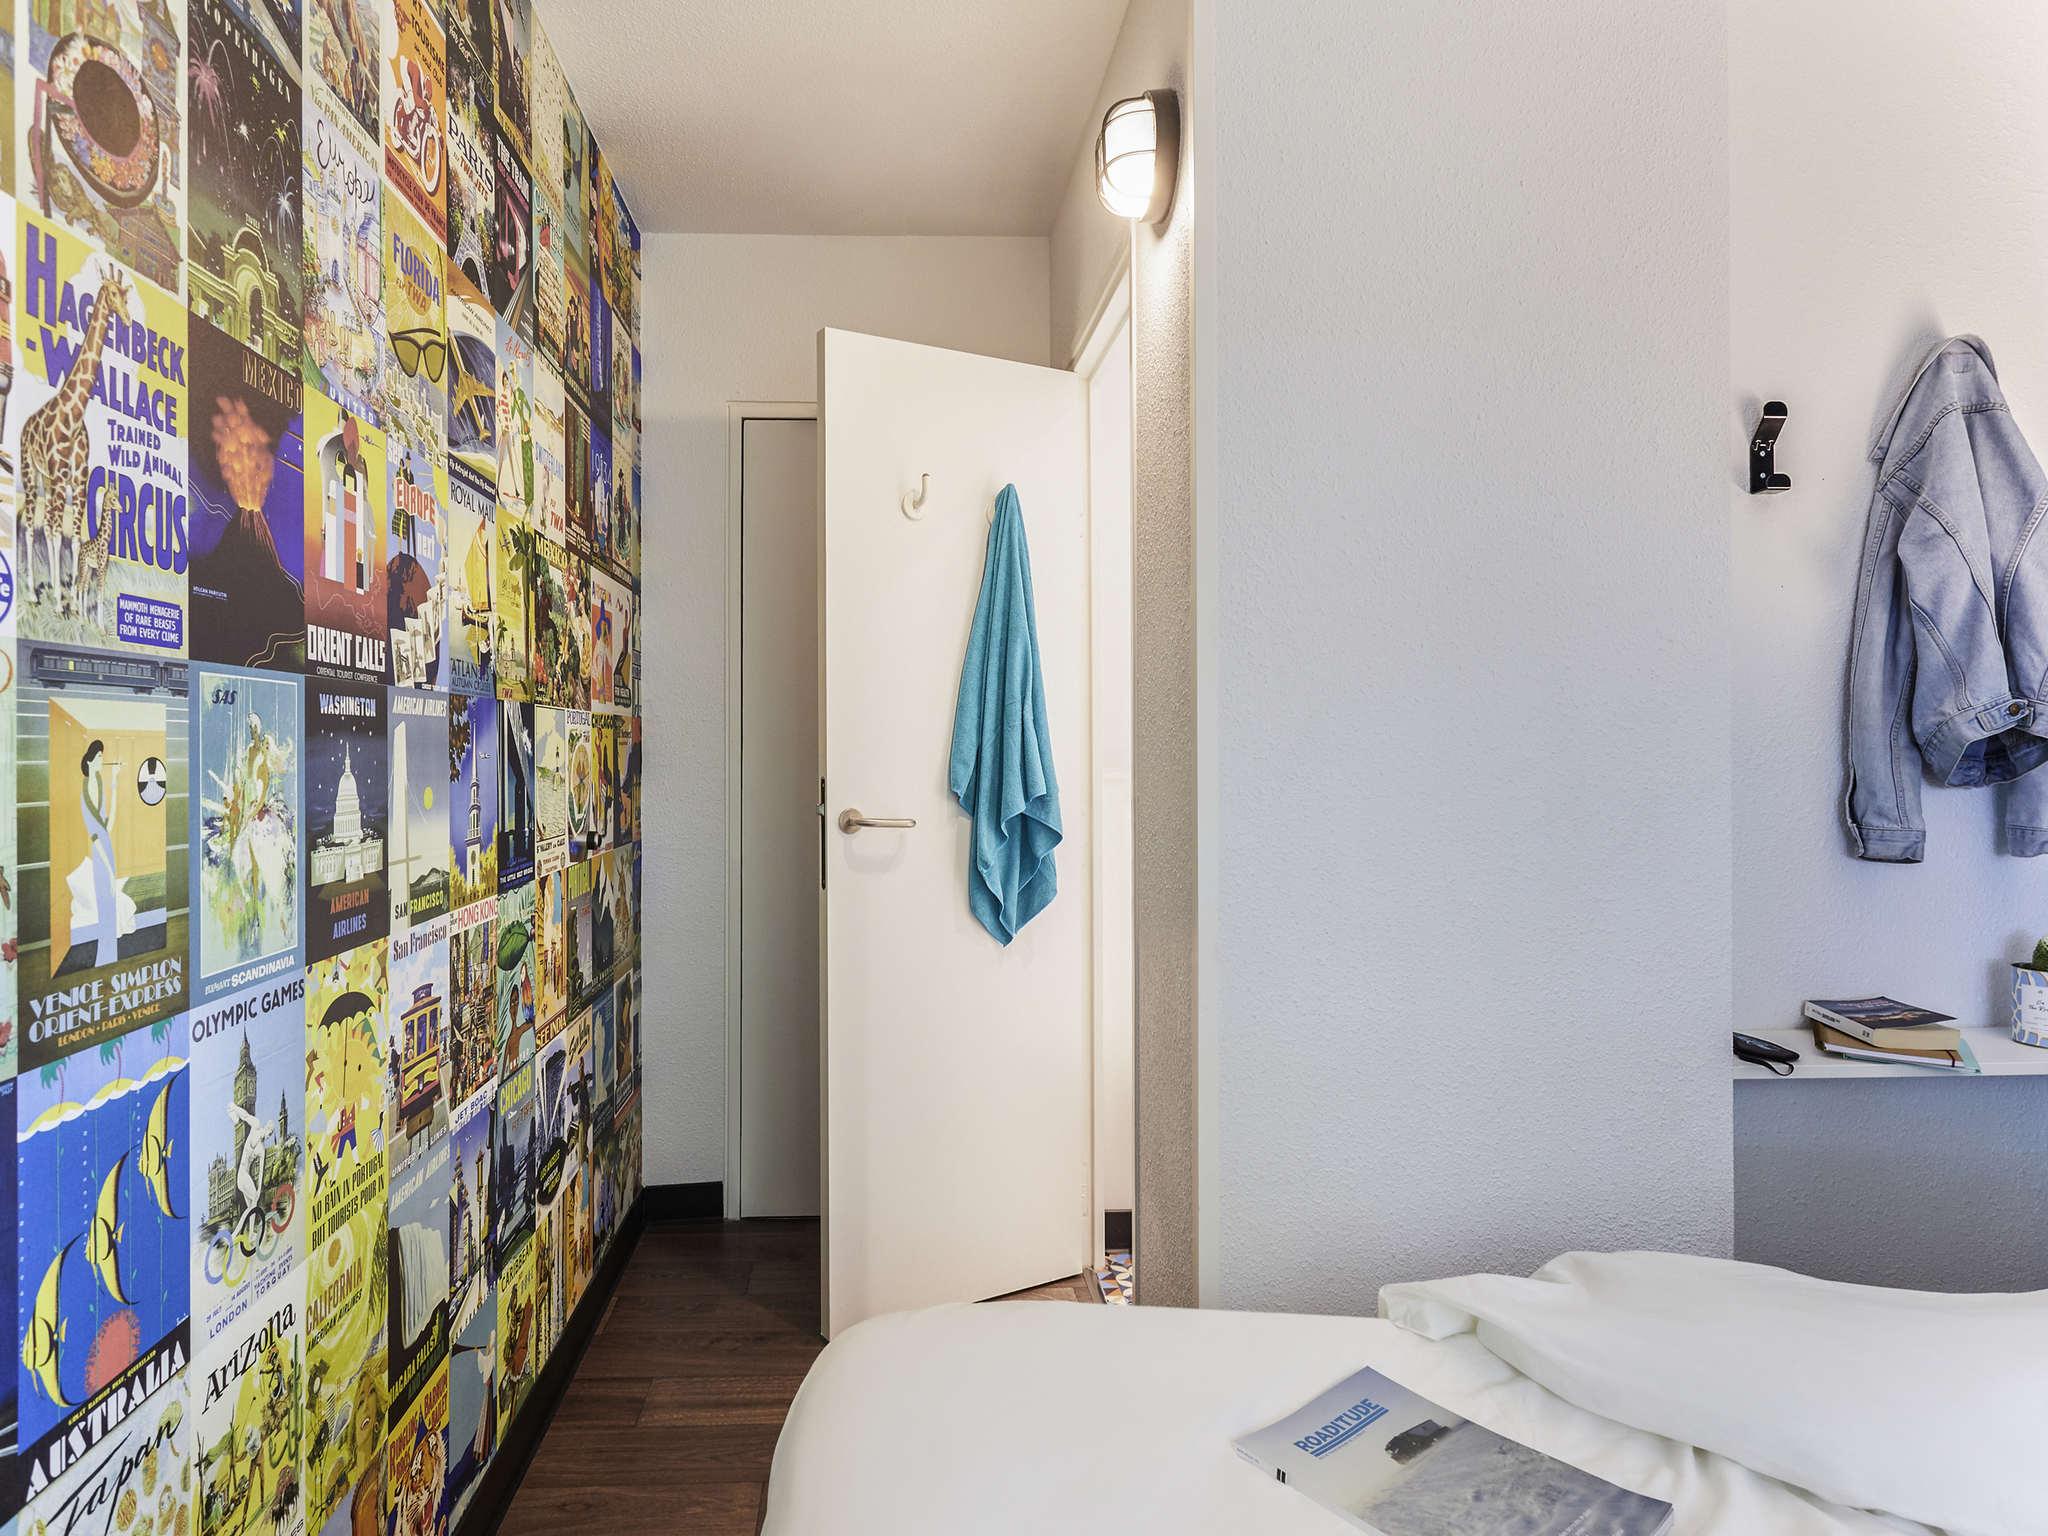 ホテル – hotelF1 Marne-la-Vallée Collégien